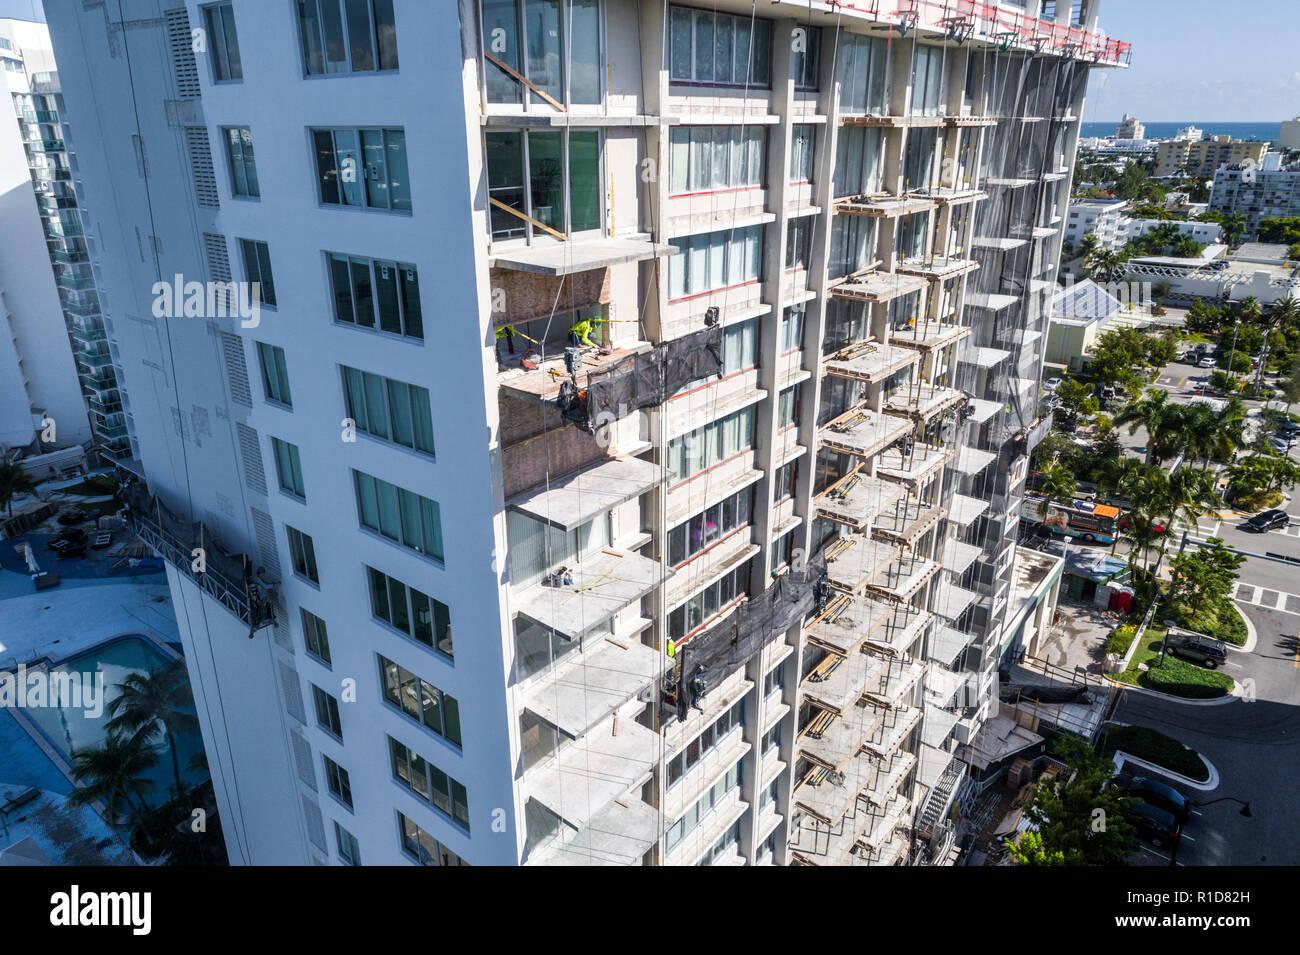 Miami Beach Florida aerial overhead bird's eye view above repair renovation replacement balconies Mirador 1000 high rise condominium building - Stock Image